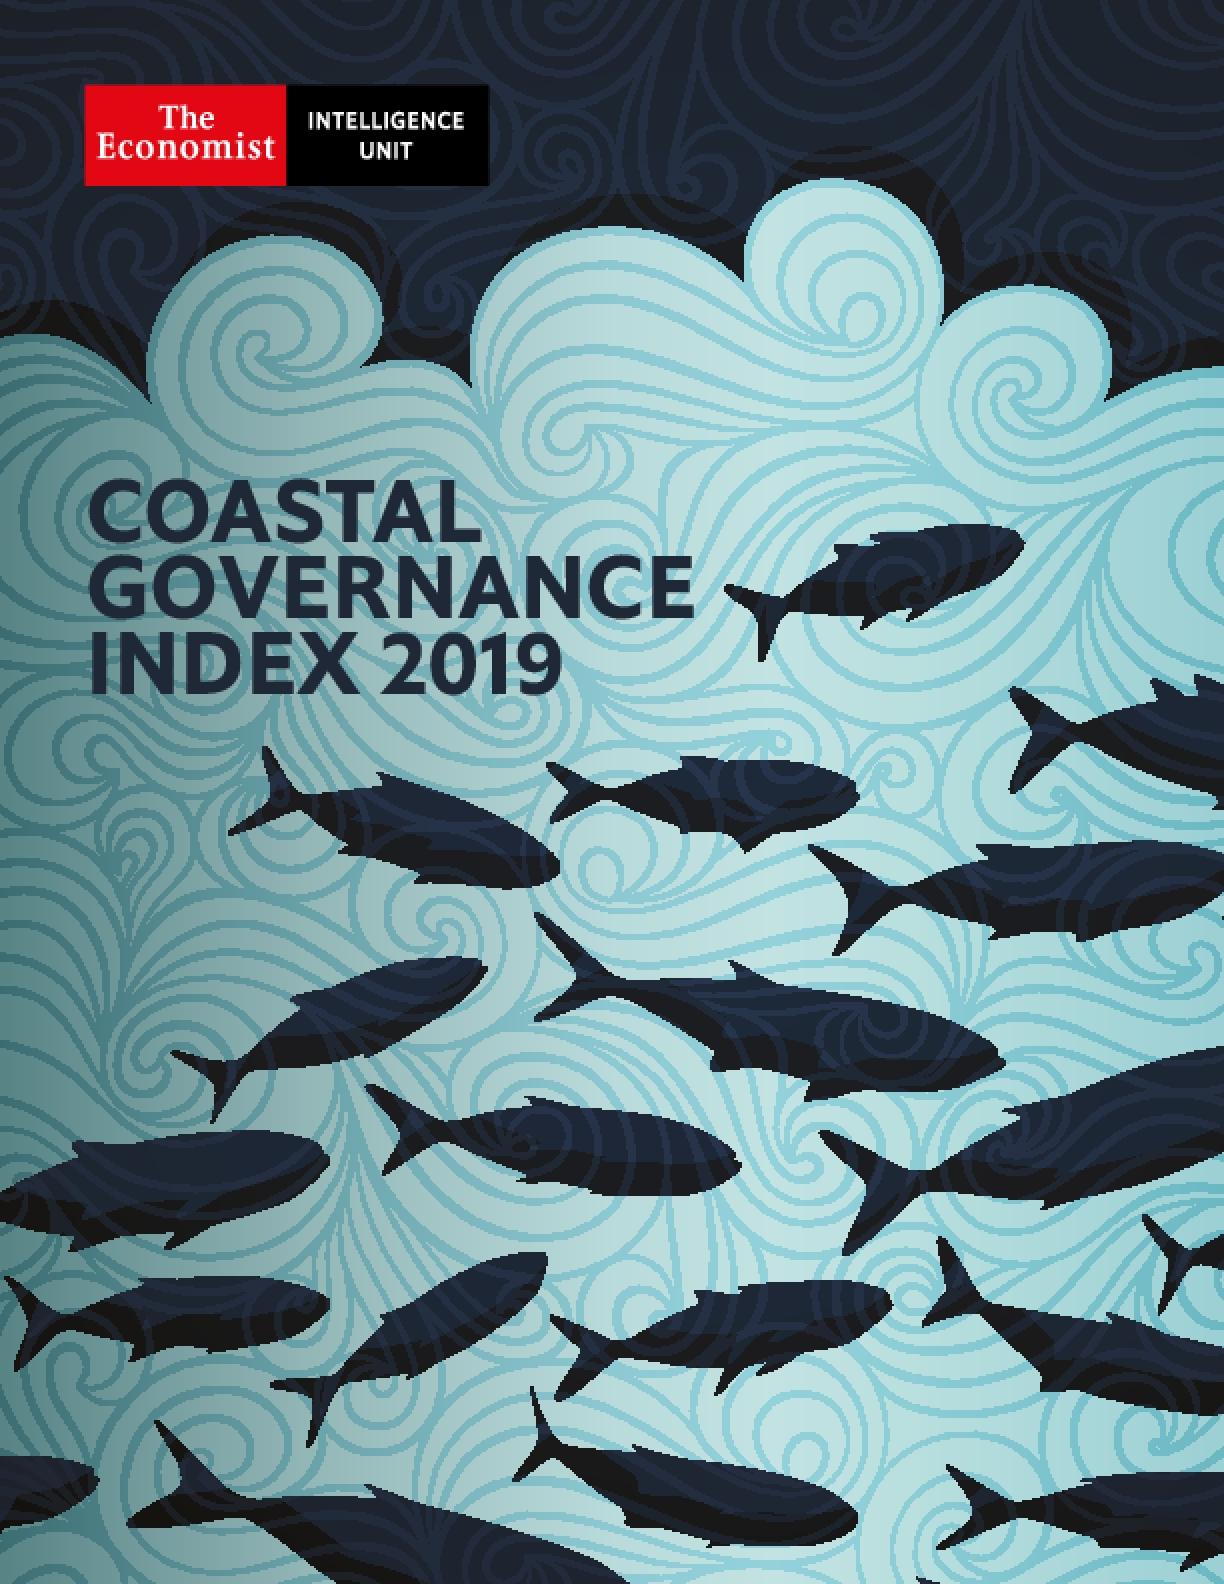 Coastal Governance Index 2019